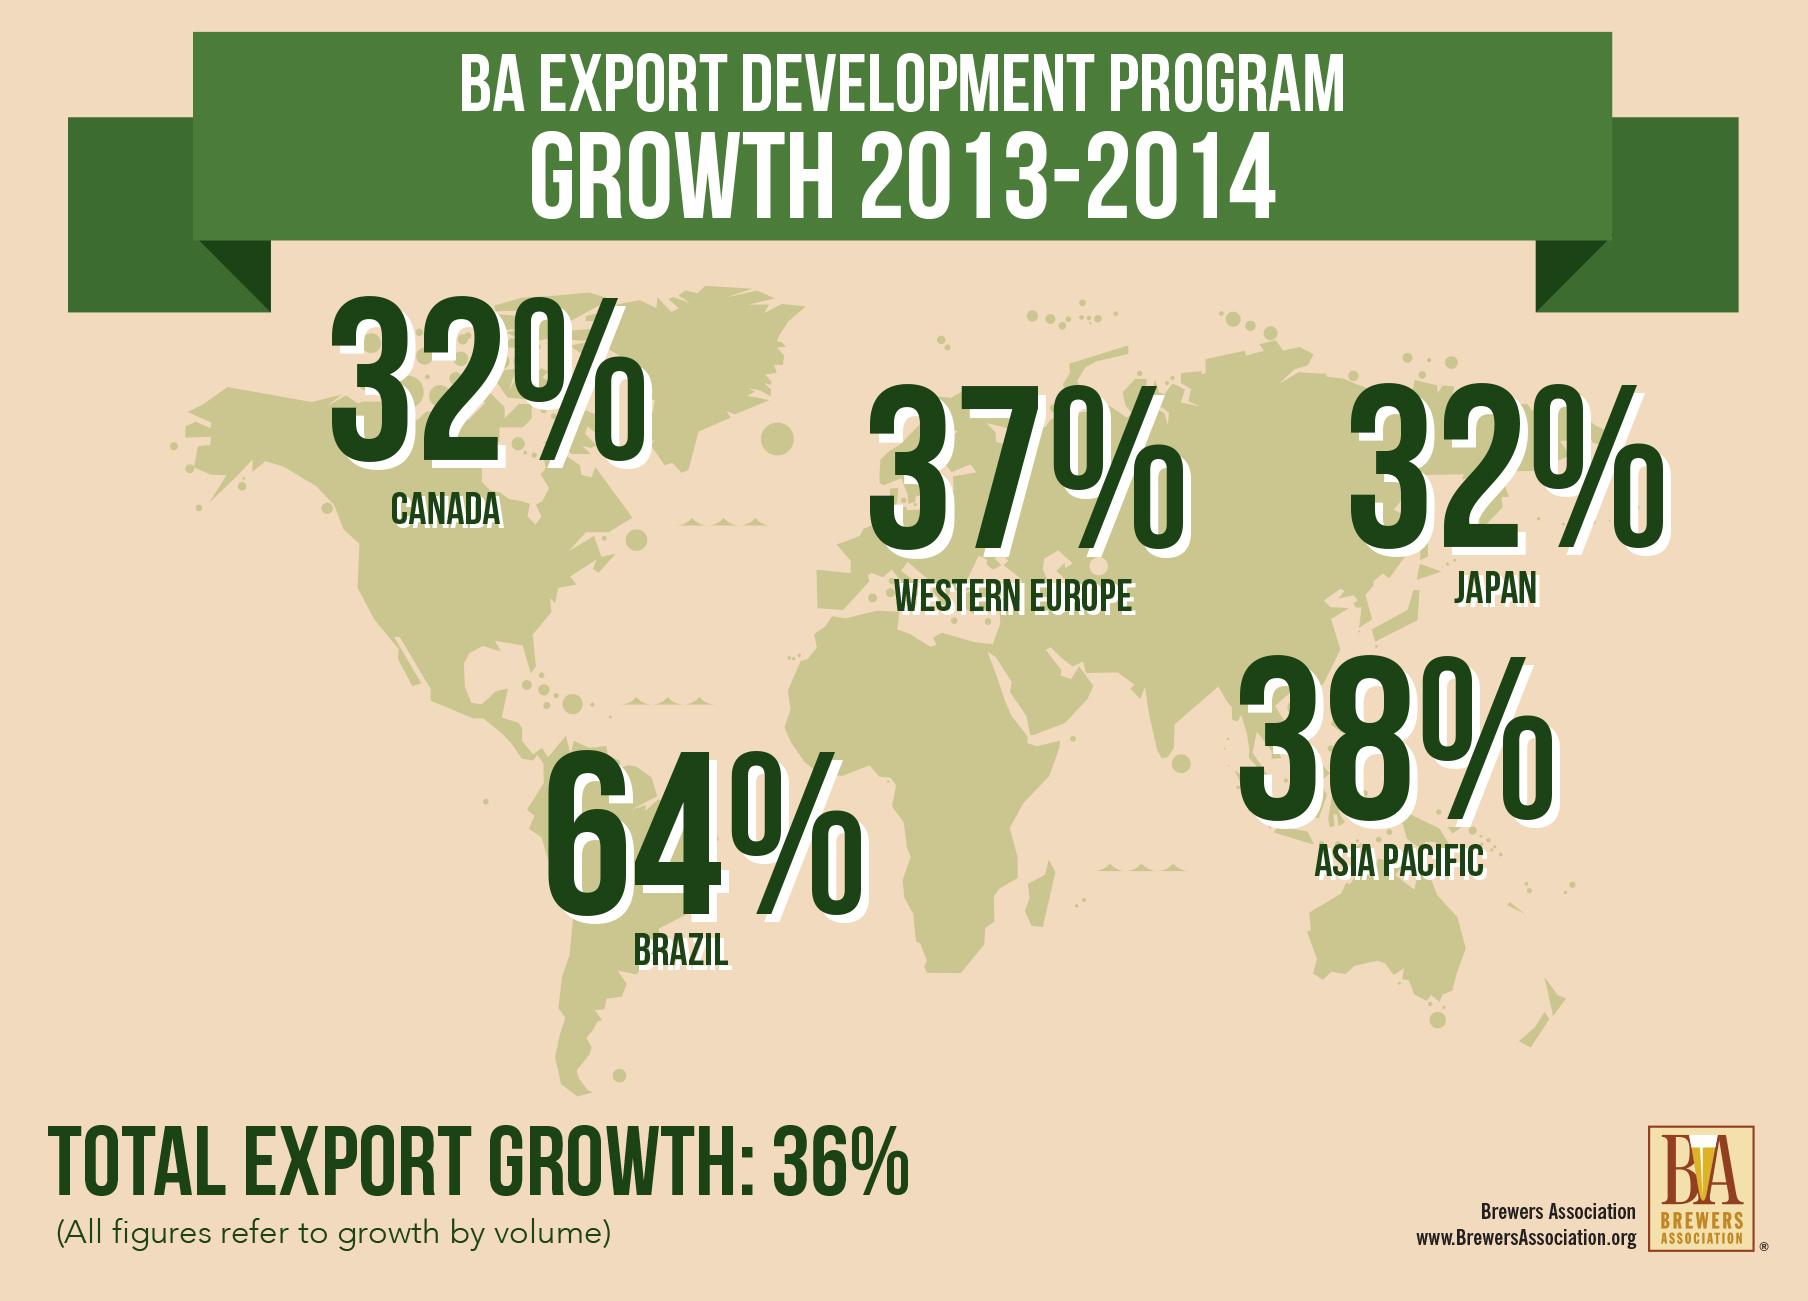 2014 Export Development Growth